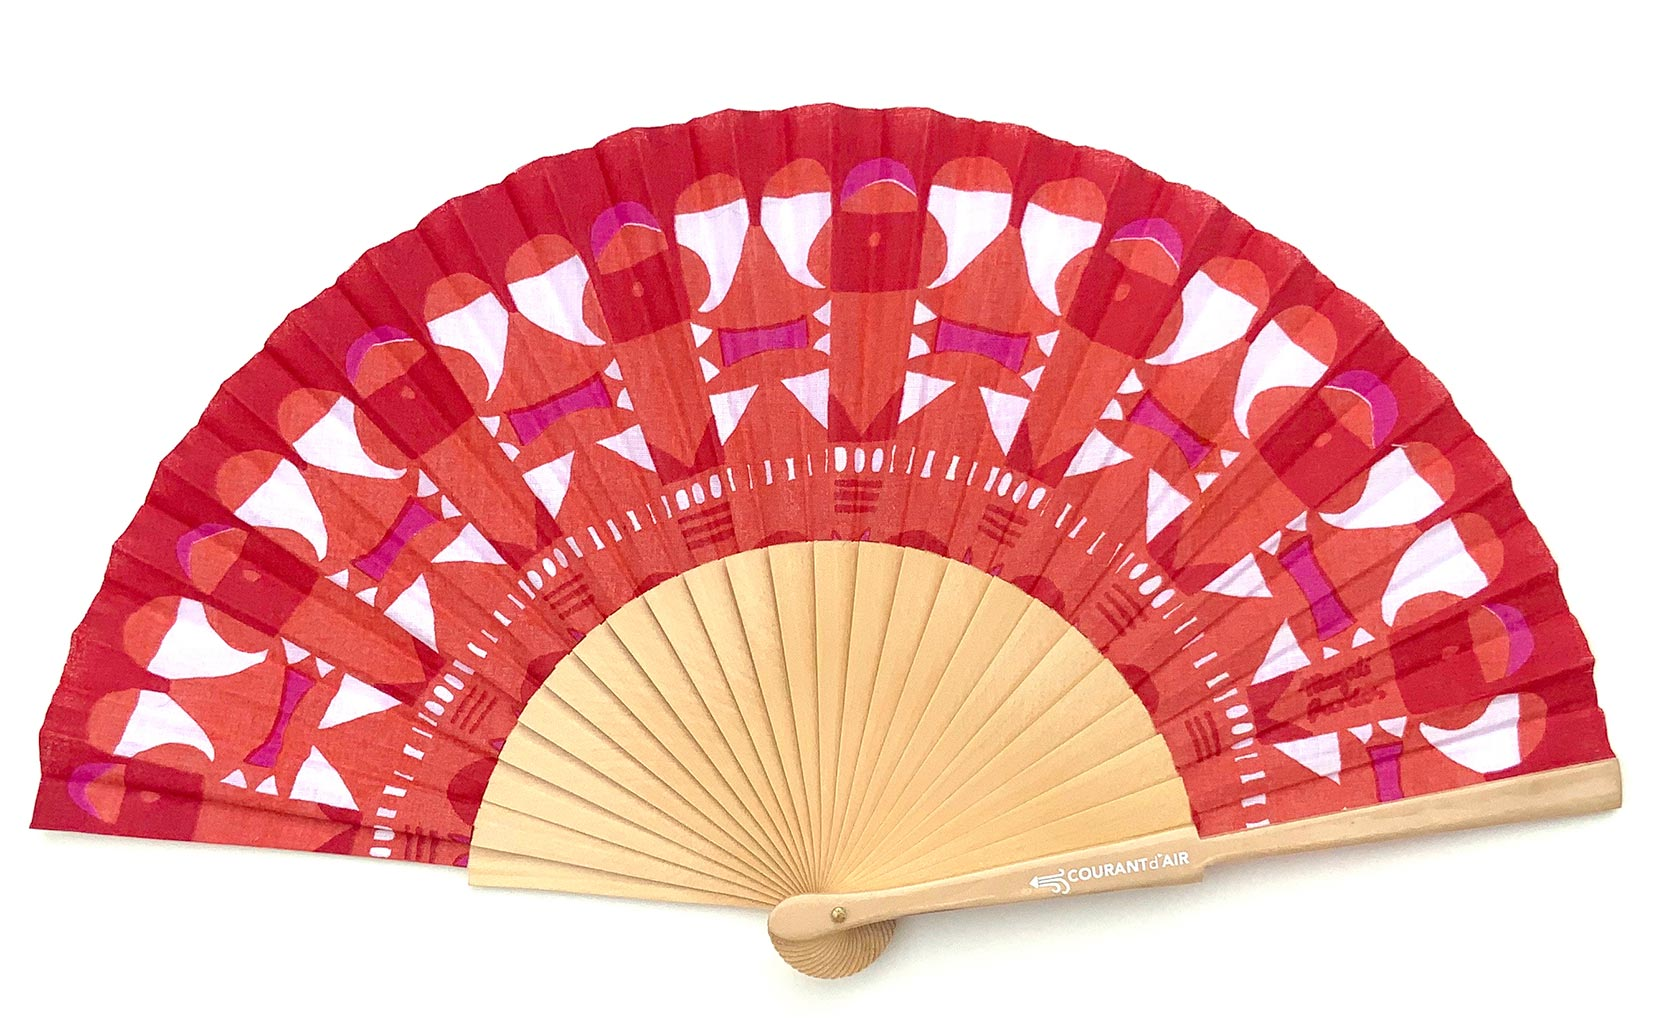 © courant d'air 01 © Magali Bardos éventail handfan abanicos motif pattern sérigraphie sur tissus silkscreen rouge rose